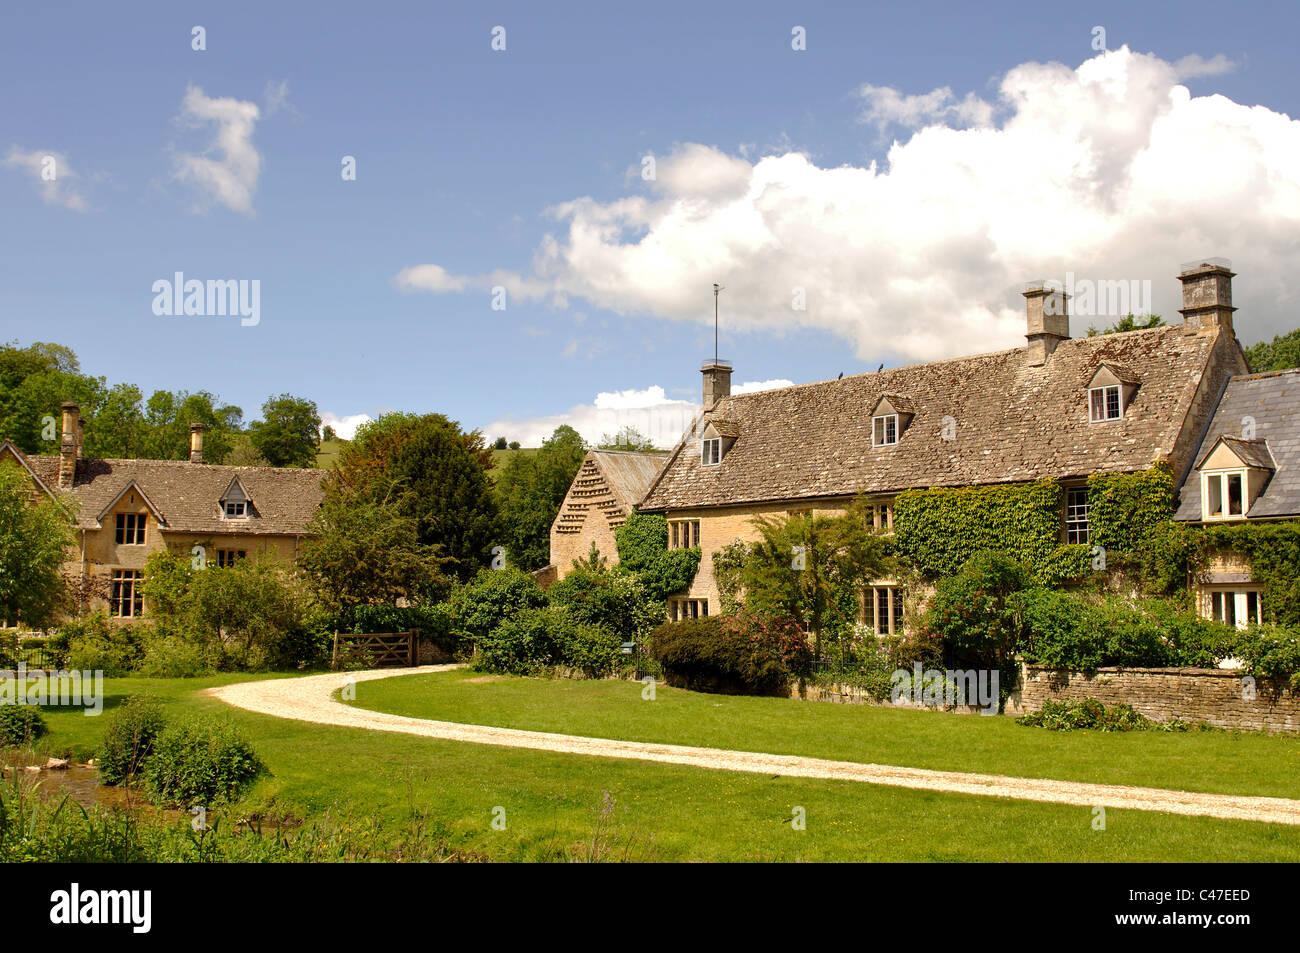 Upper Slaughter village, Gloucestershire, England, UK Stock Photo